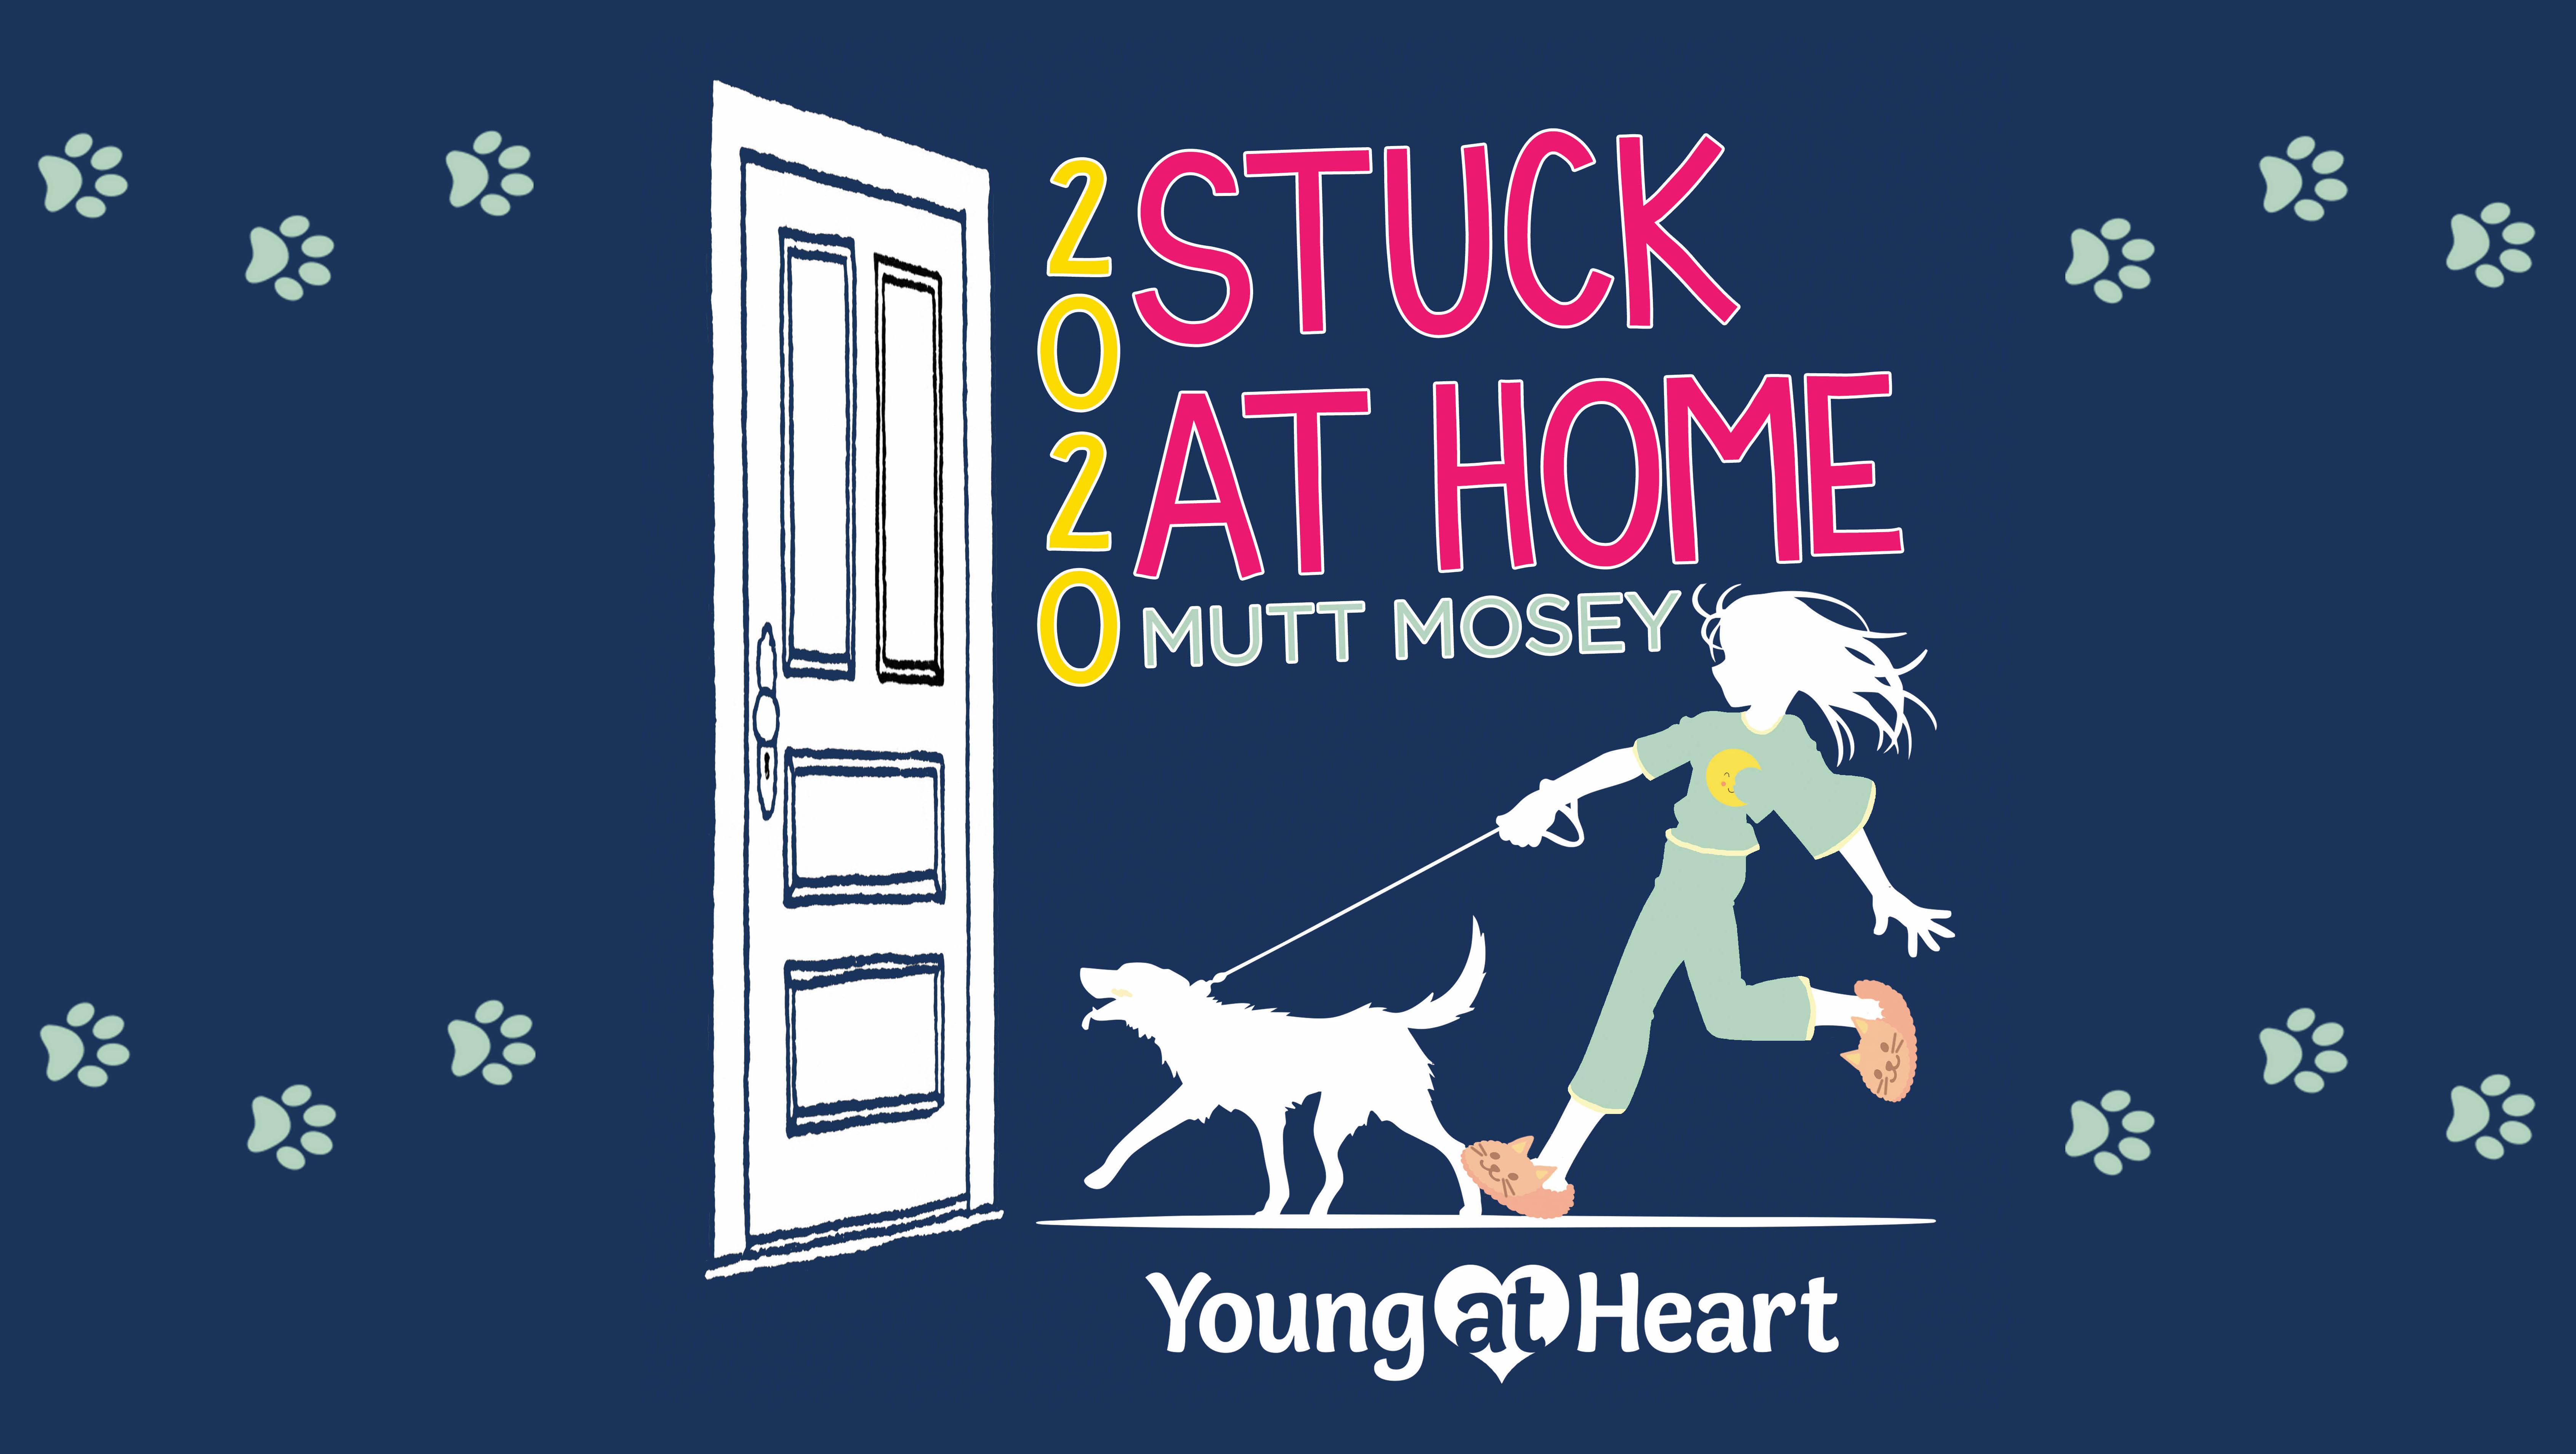 stuck at home mutt mosey